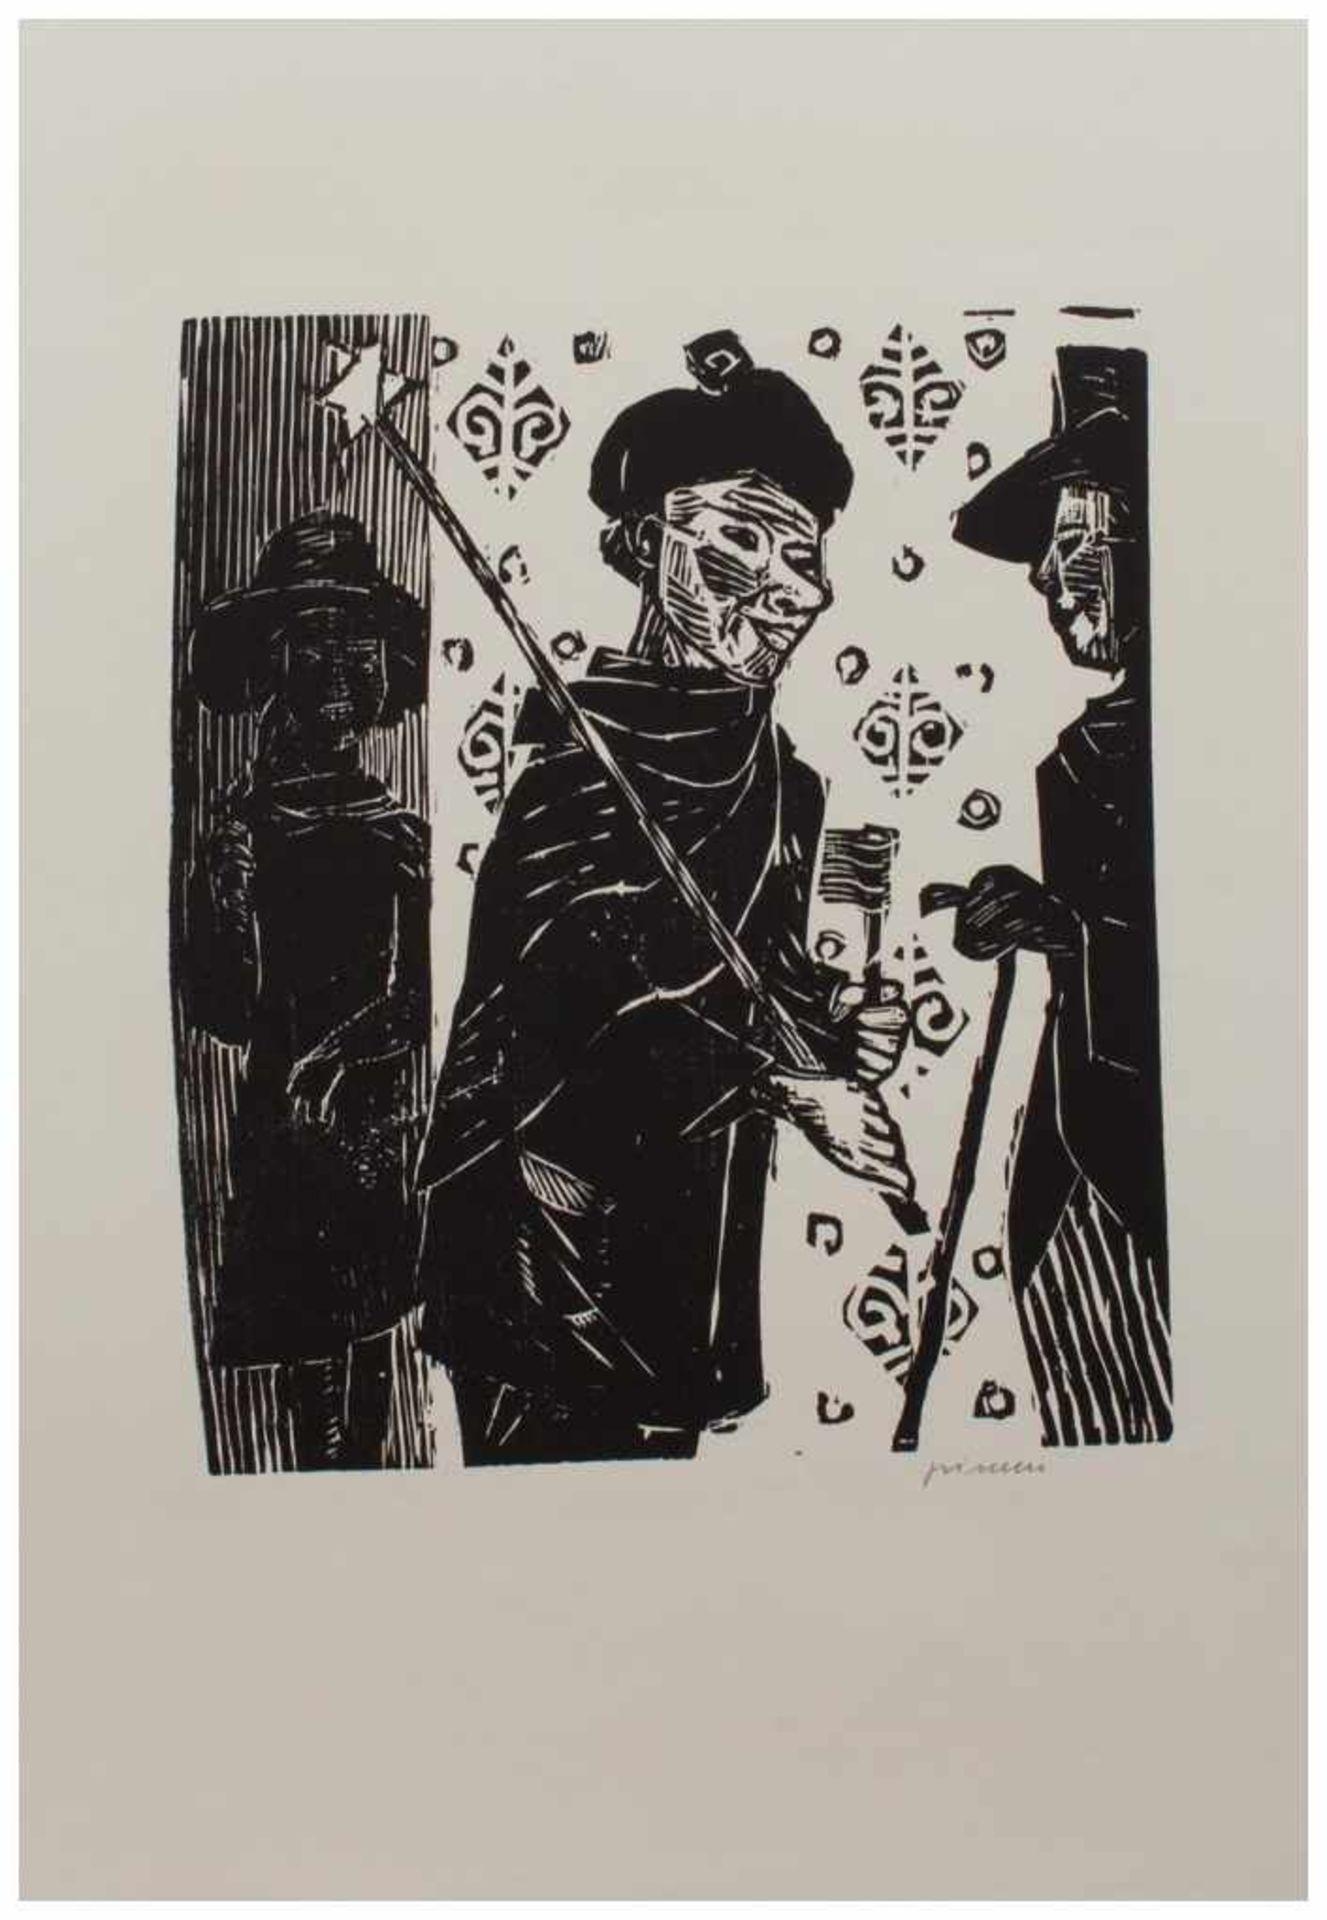 Los 38 - Wilhelm Grimm (Eberstadt 1904 - 1986 Hamburg, deutscher Maler u. Grafiker, Std. a.d. Werkkunstschule